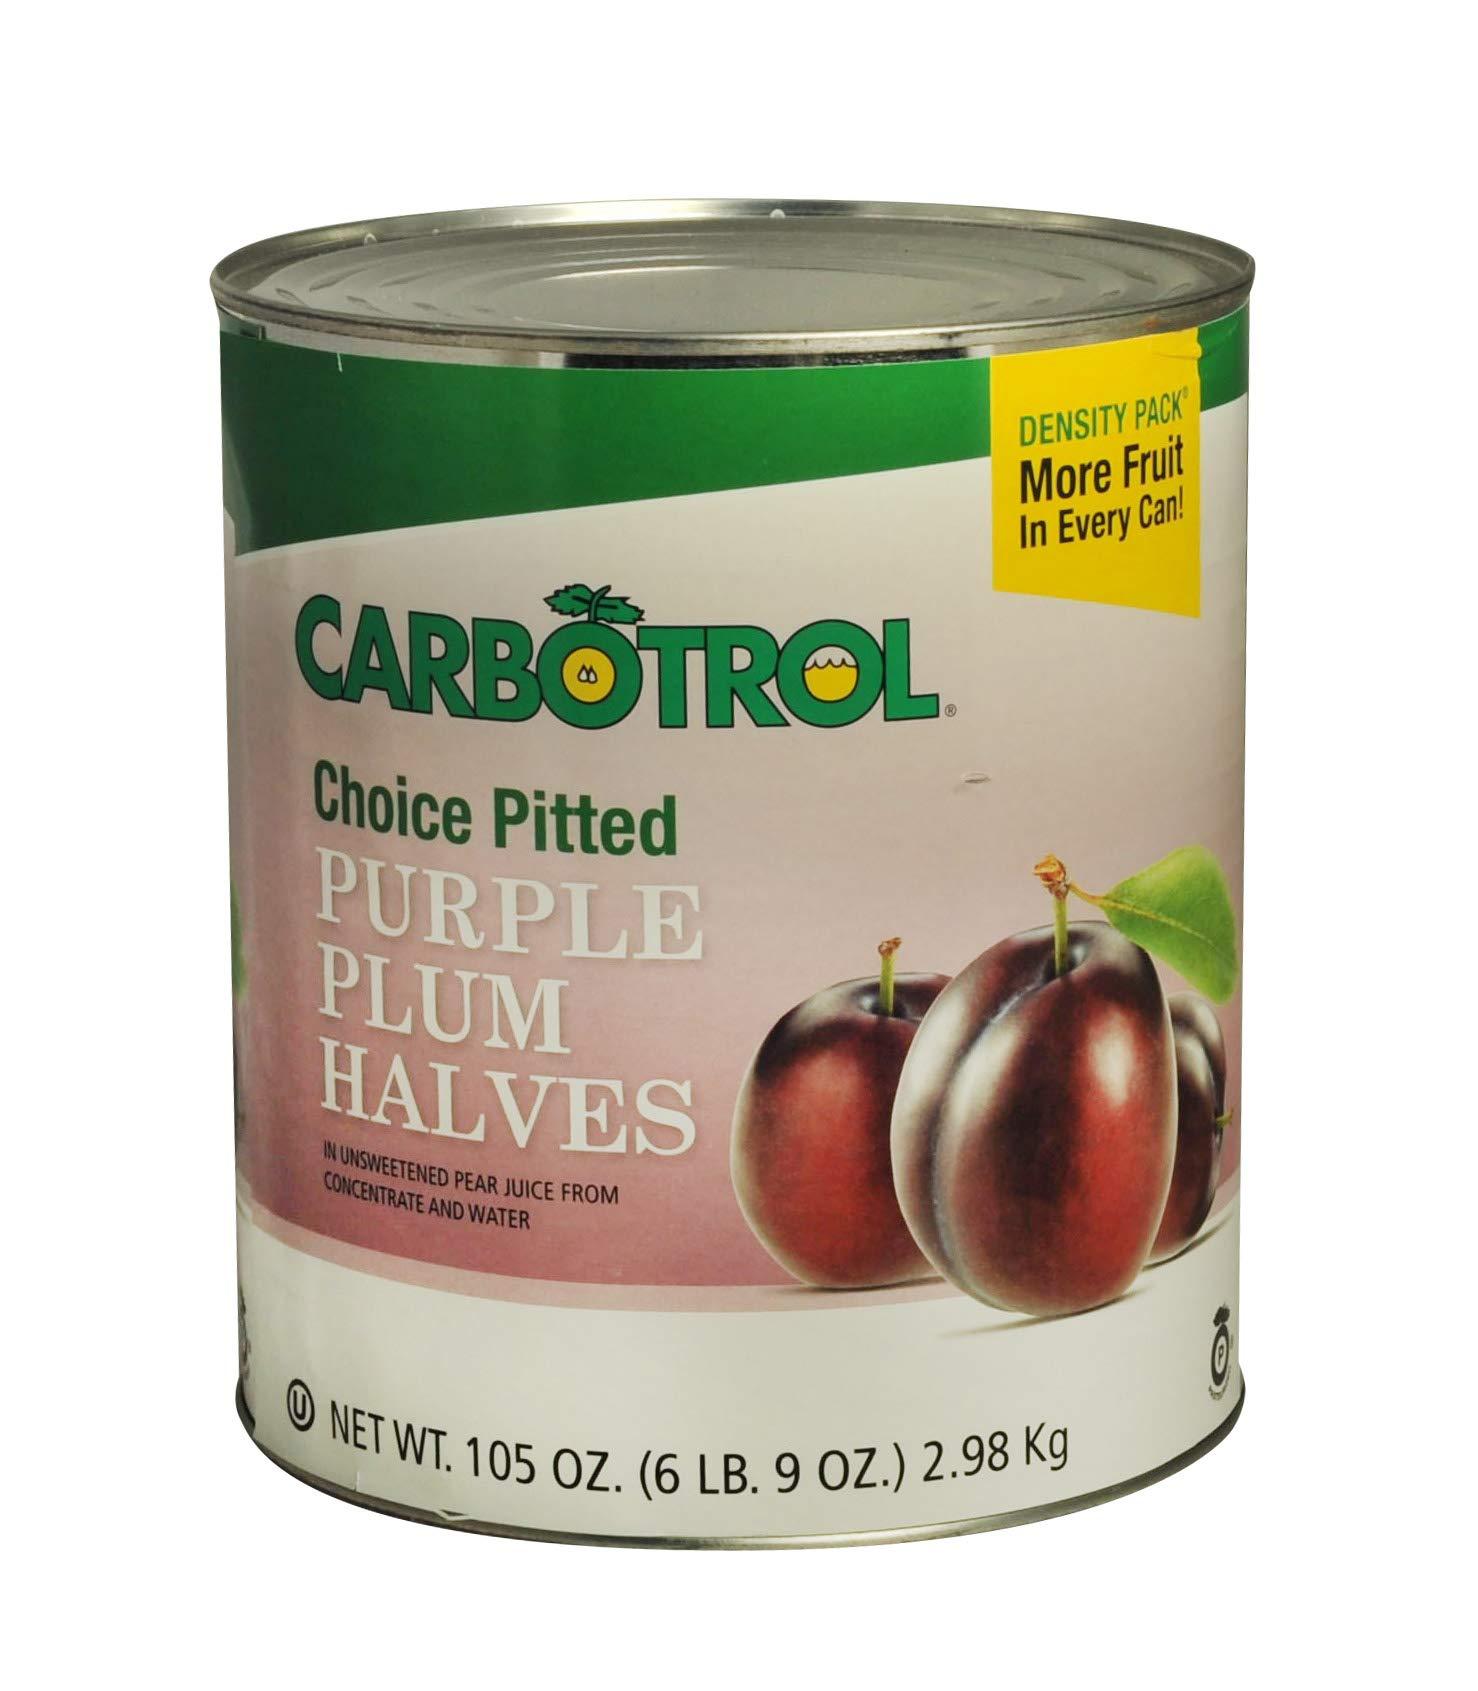 Carbotrol Plum Halves, #10 Canned Fruit - 105oz (Case of 6 Cans) by Carbotrol